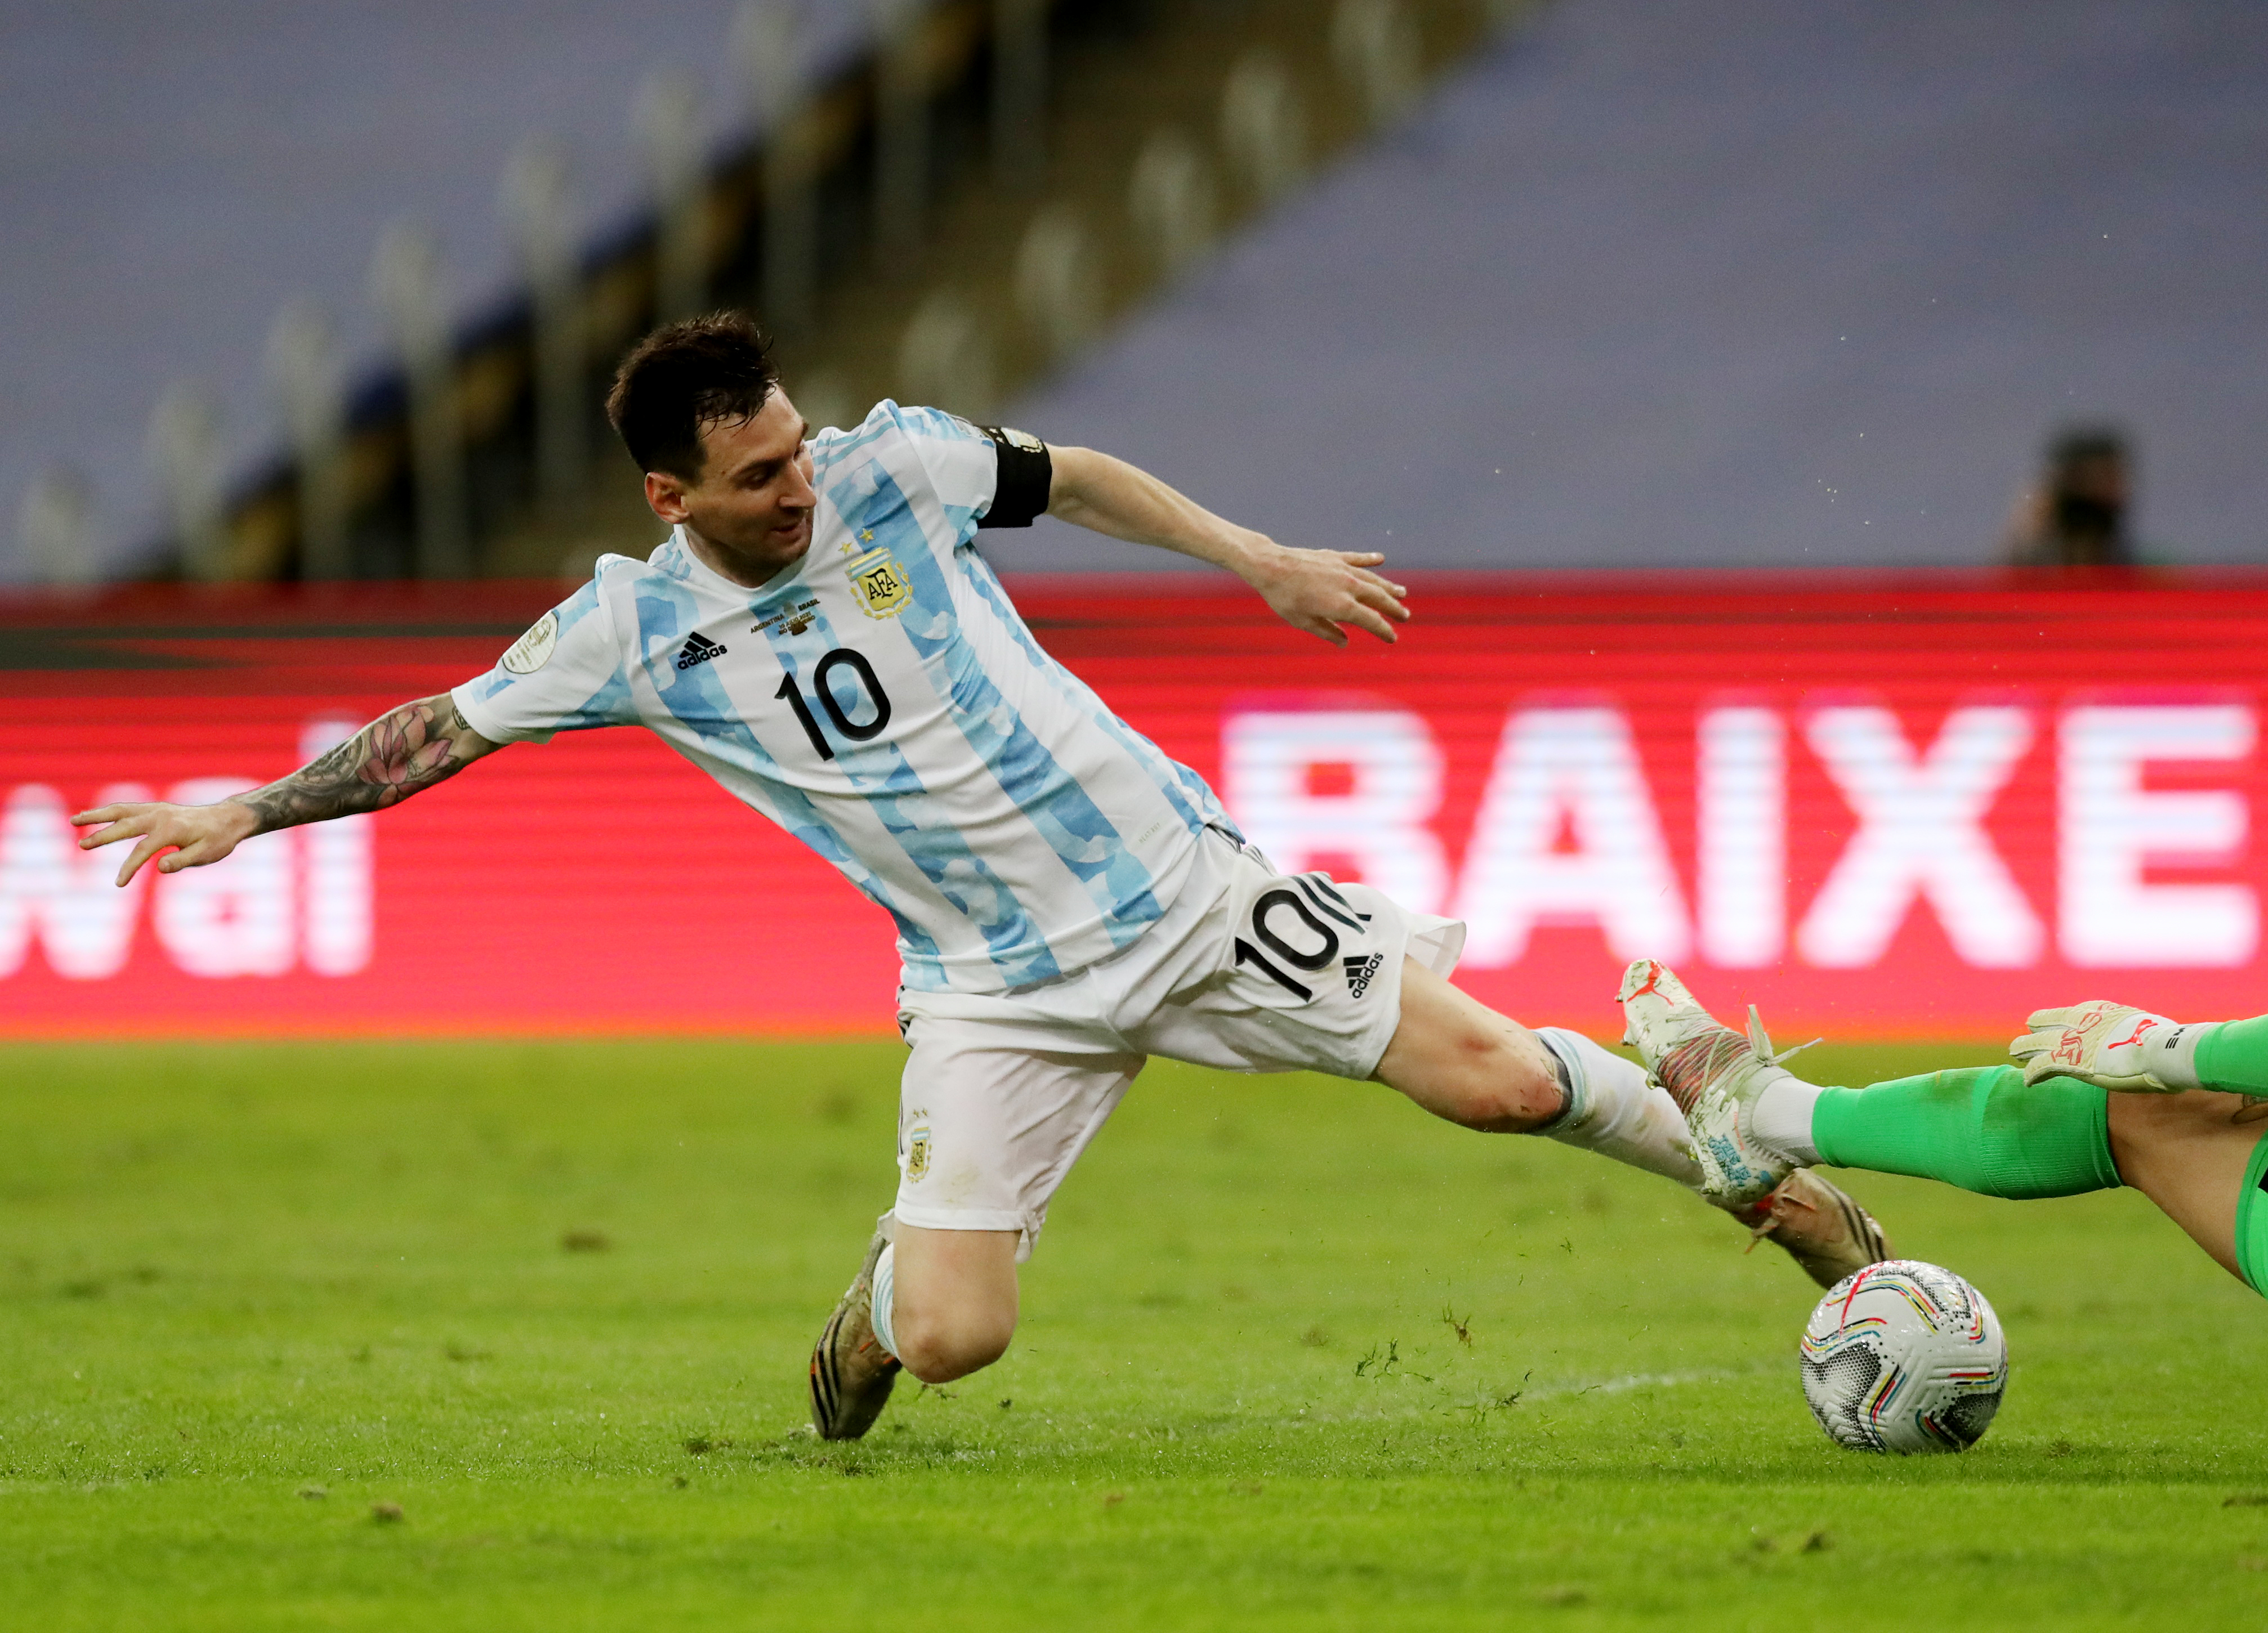 Soccer Football - Copa America  2021 - Final - Brazil v Argentina - Estadio Maracana, Rio de Janeiro, Brazil - July 10, 2021 Argentina's Lionel Messi in action REUTERS/Amanda Perobelli